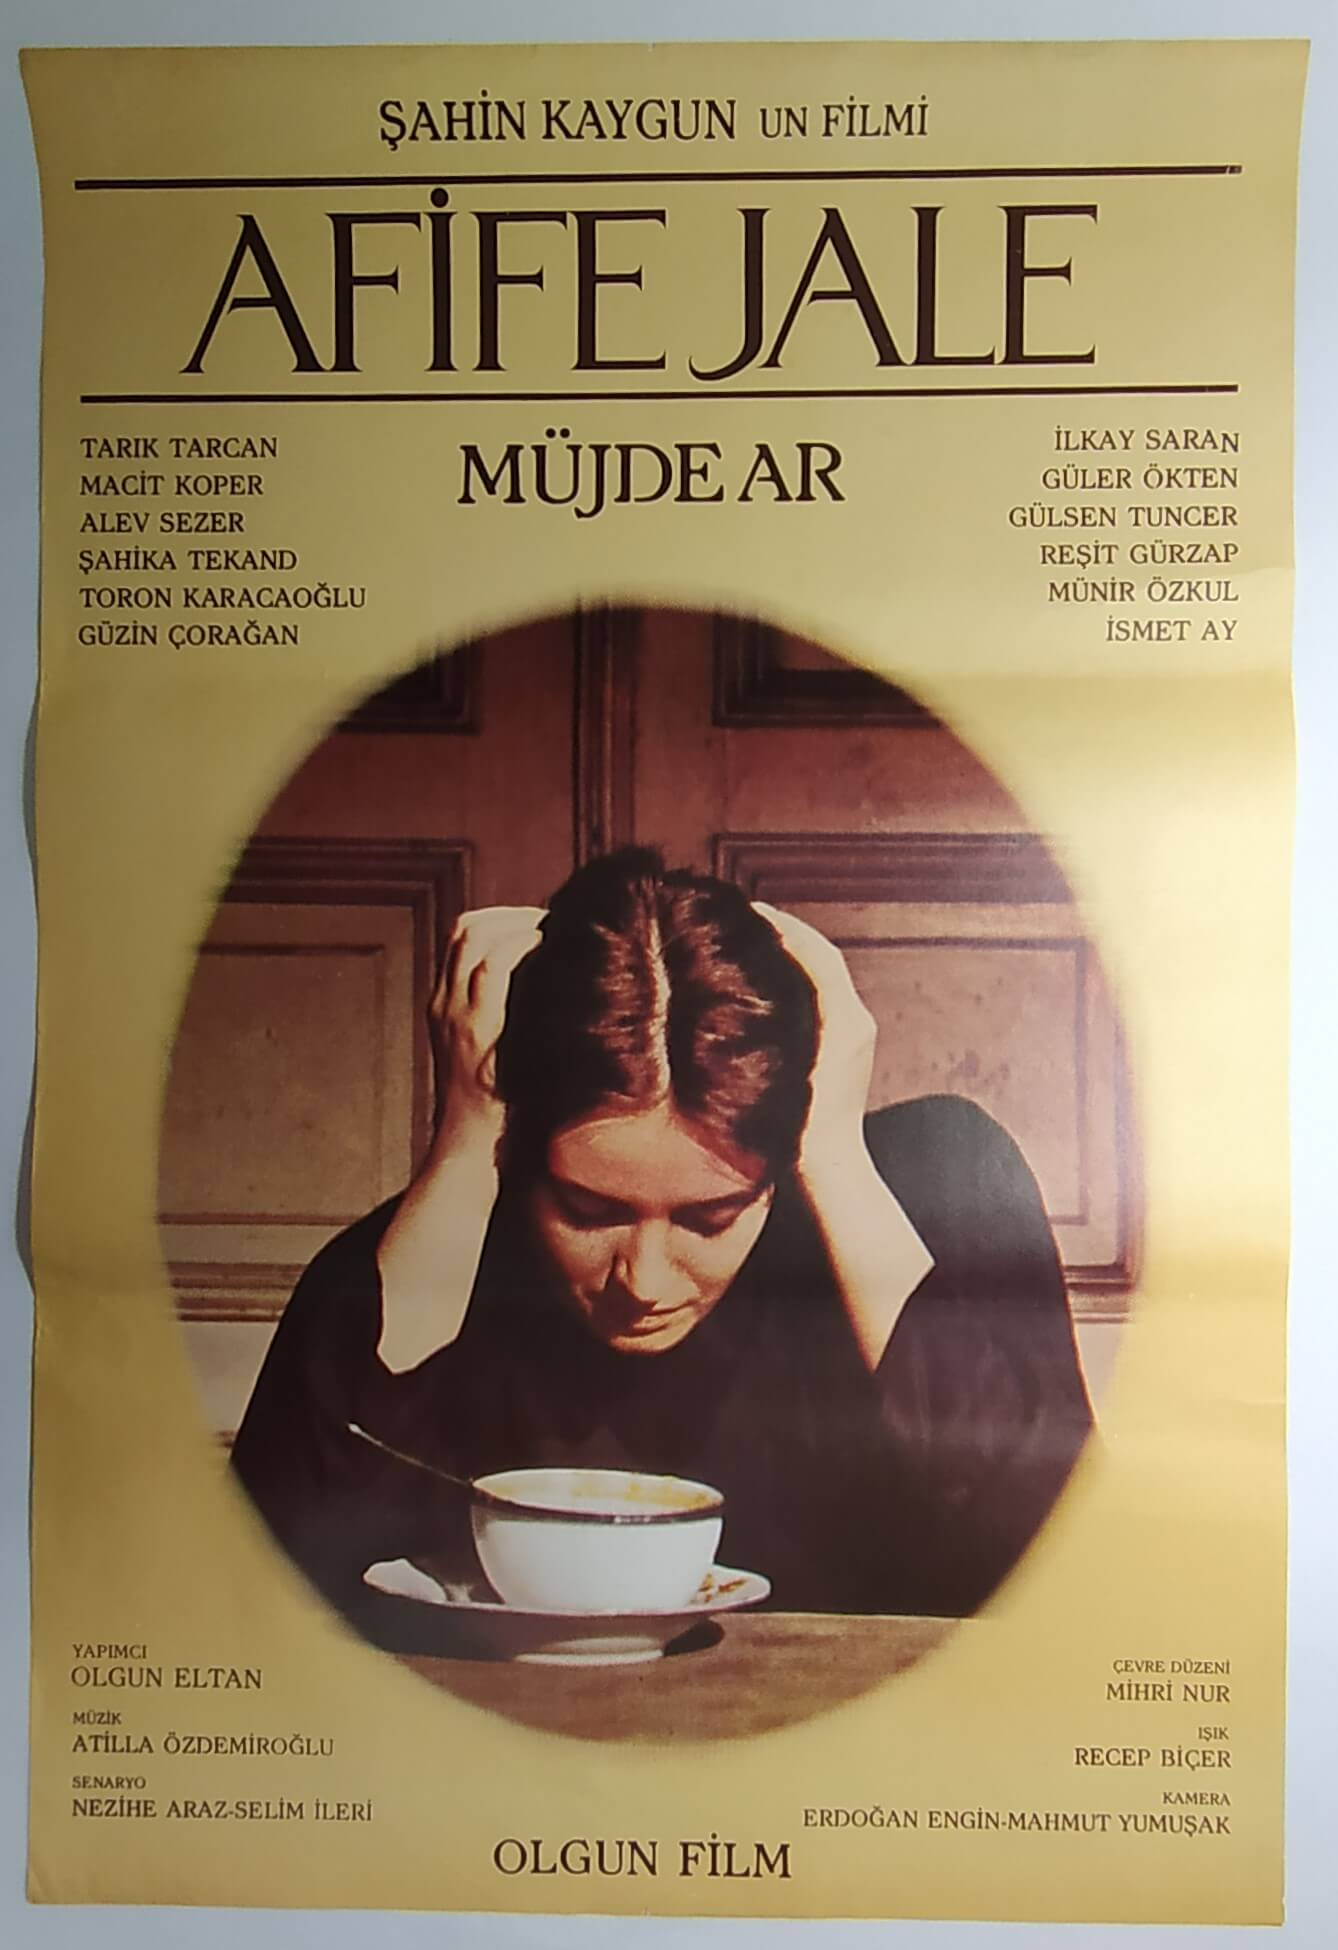 AFIFE JALE movie poster